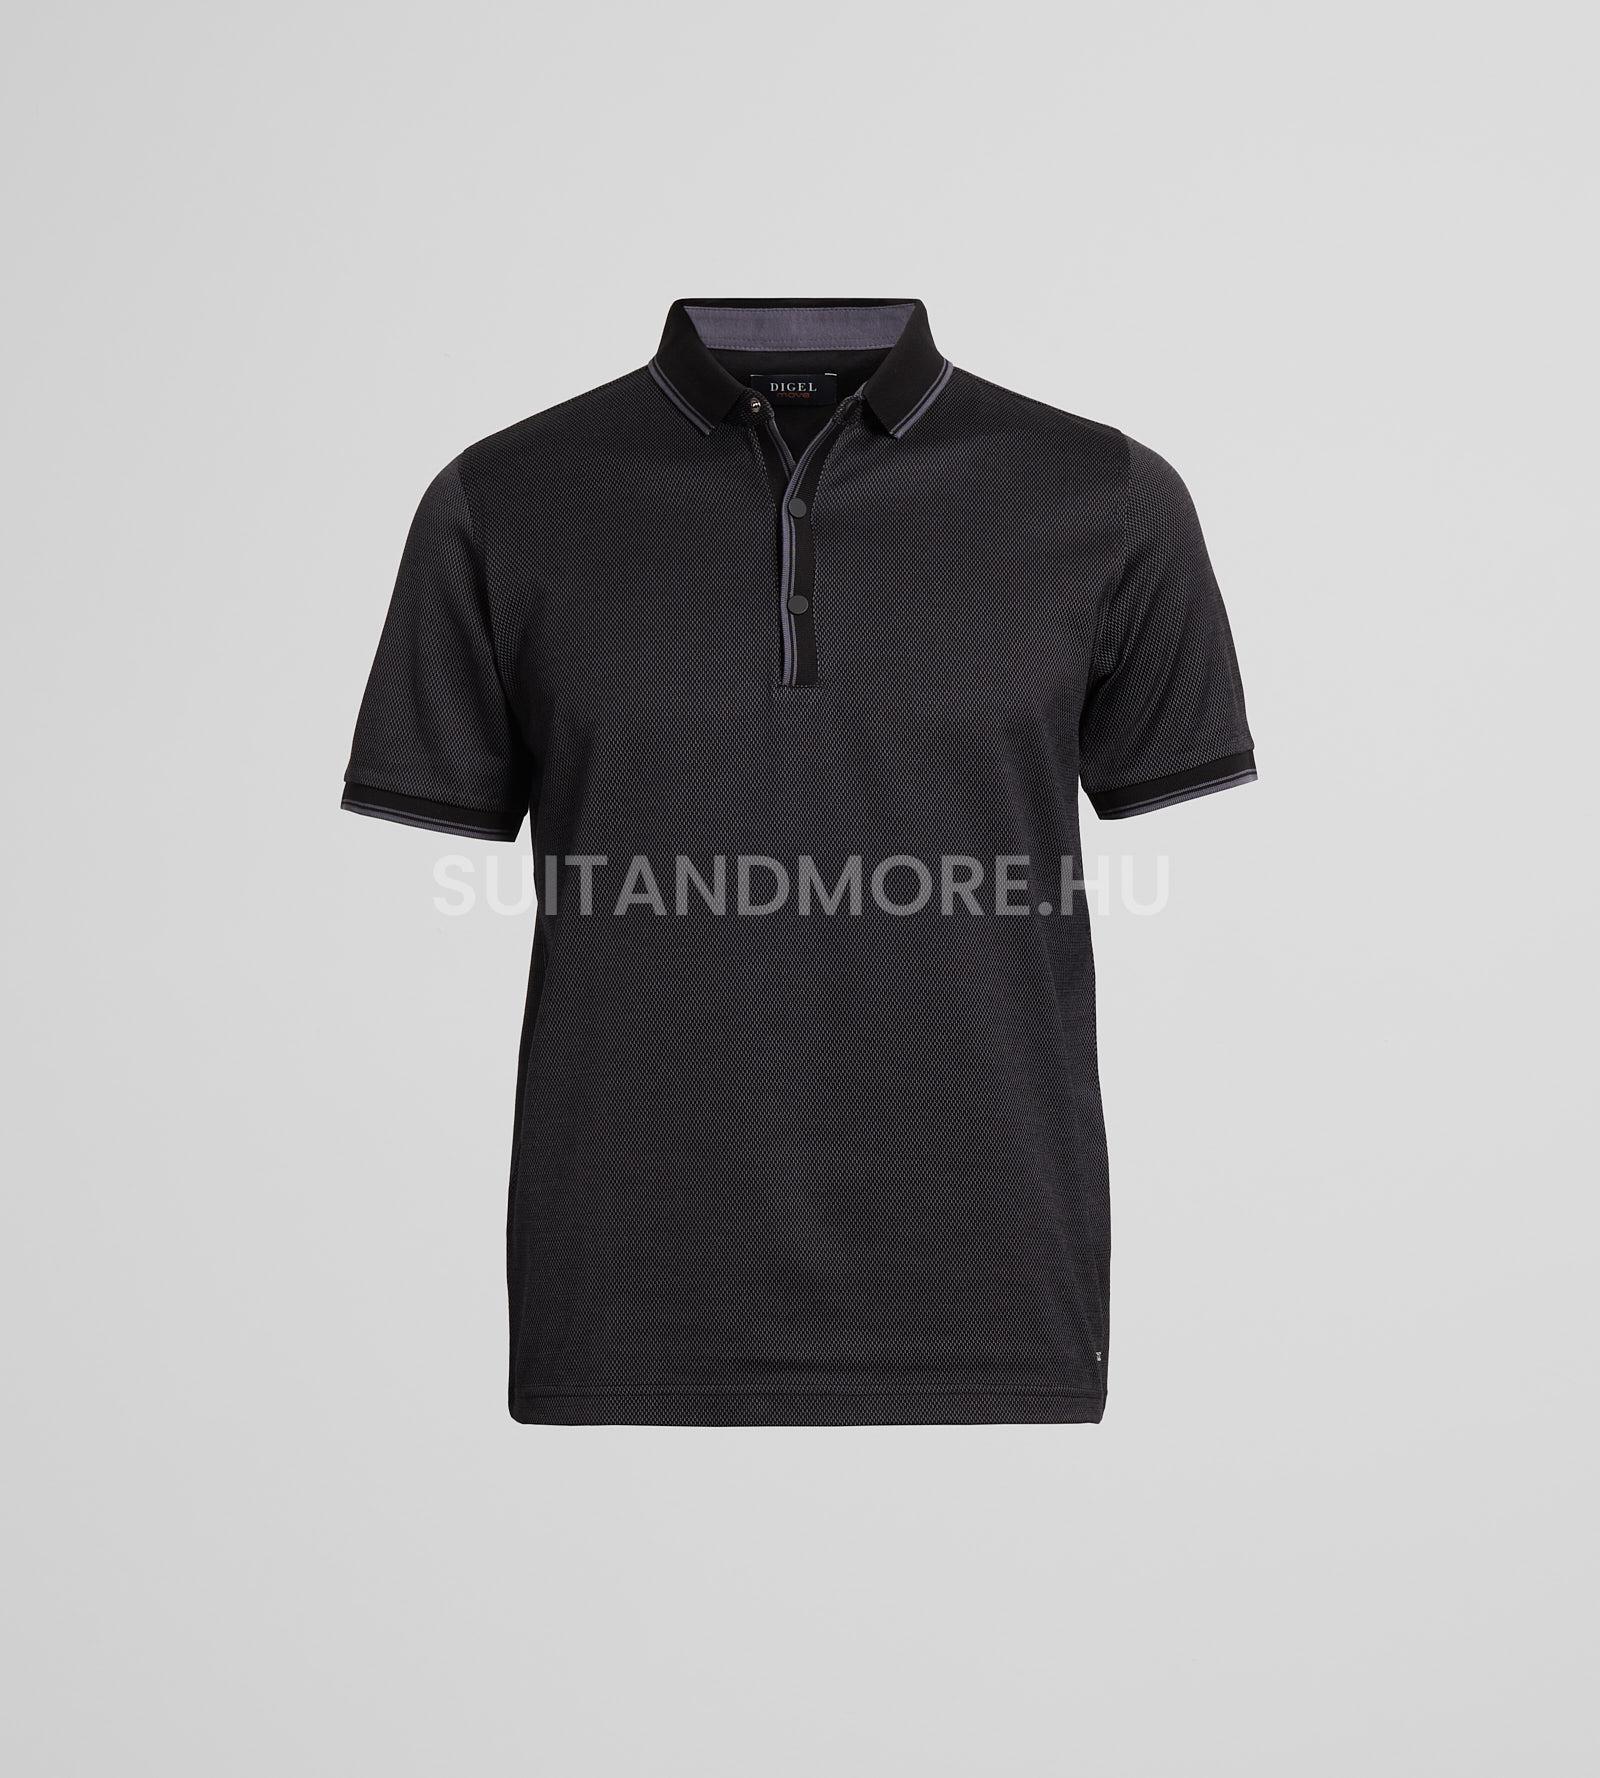 digel-fekete-slim-fit-v-nyaku-pamut-ingpolo-andrea1-2-1178117-10